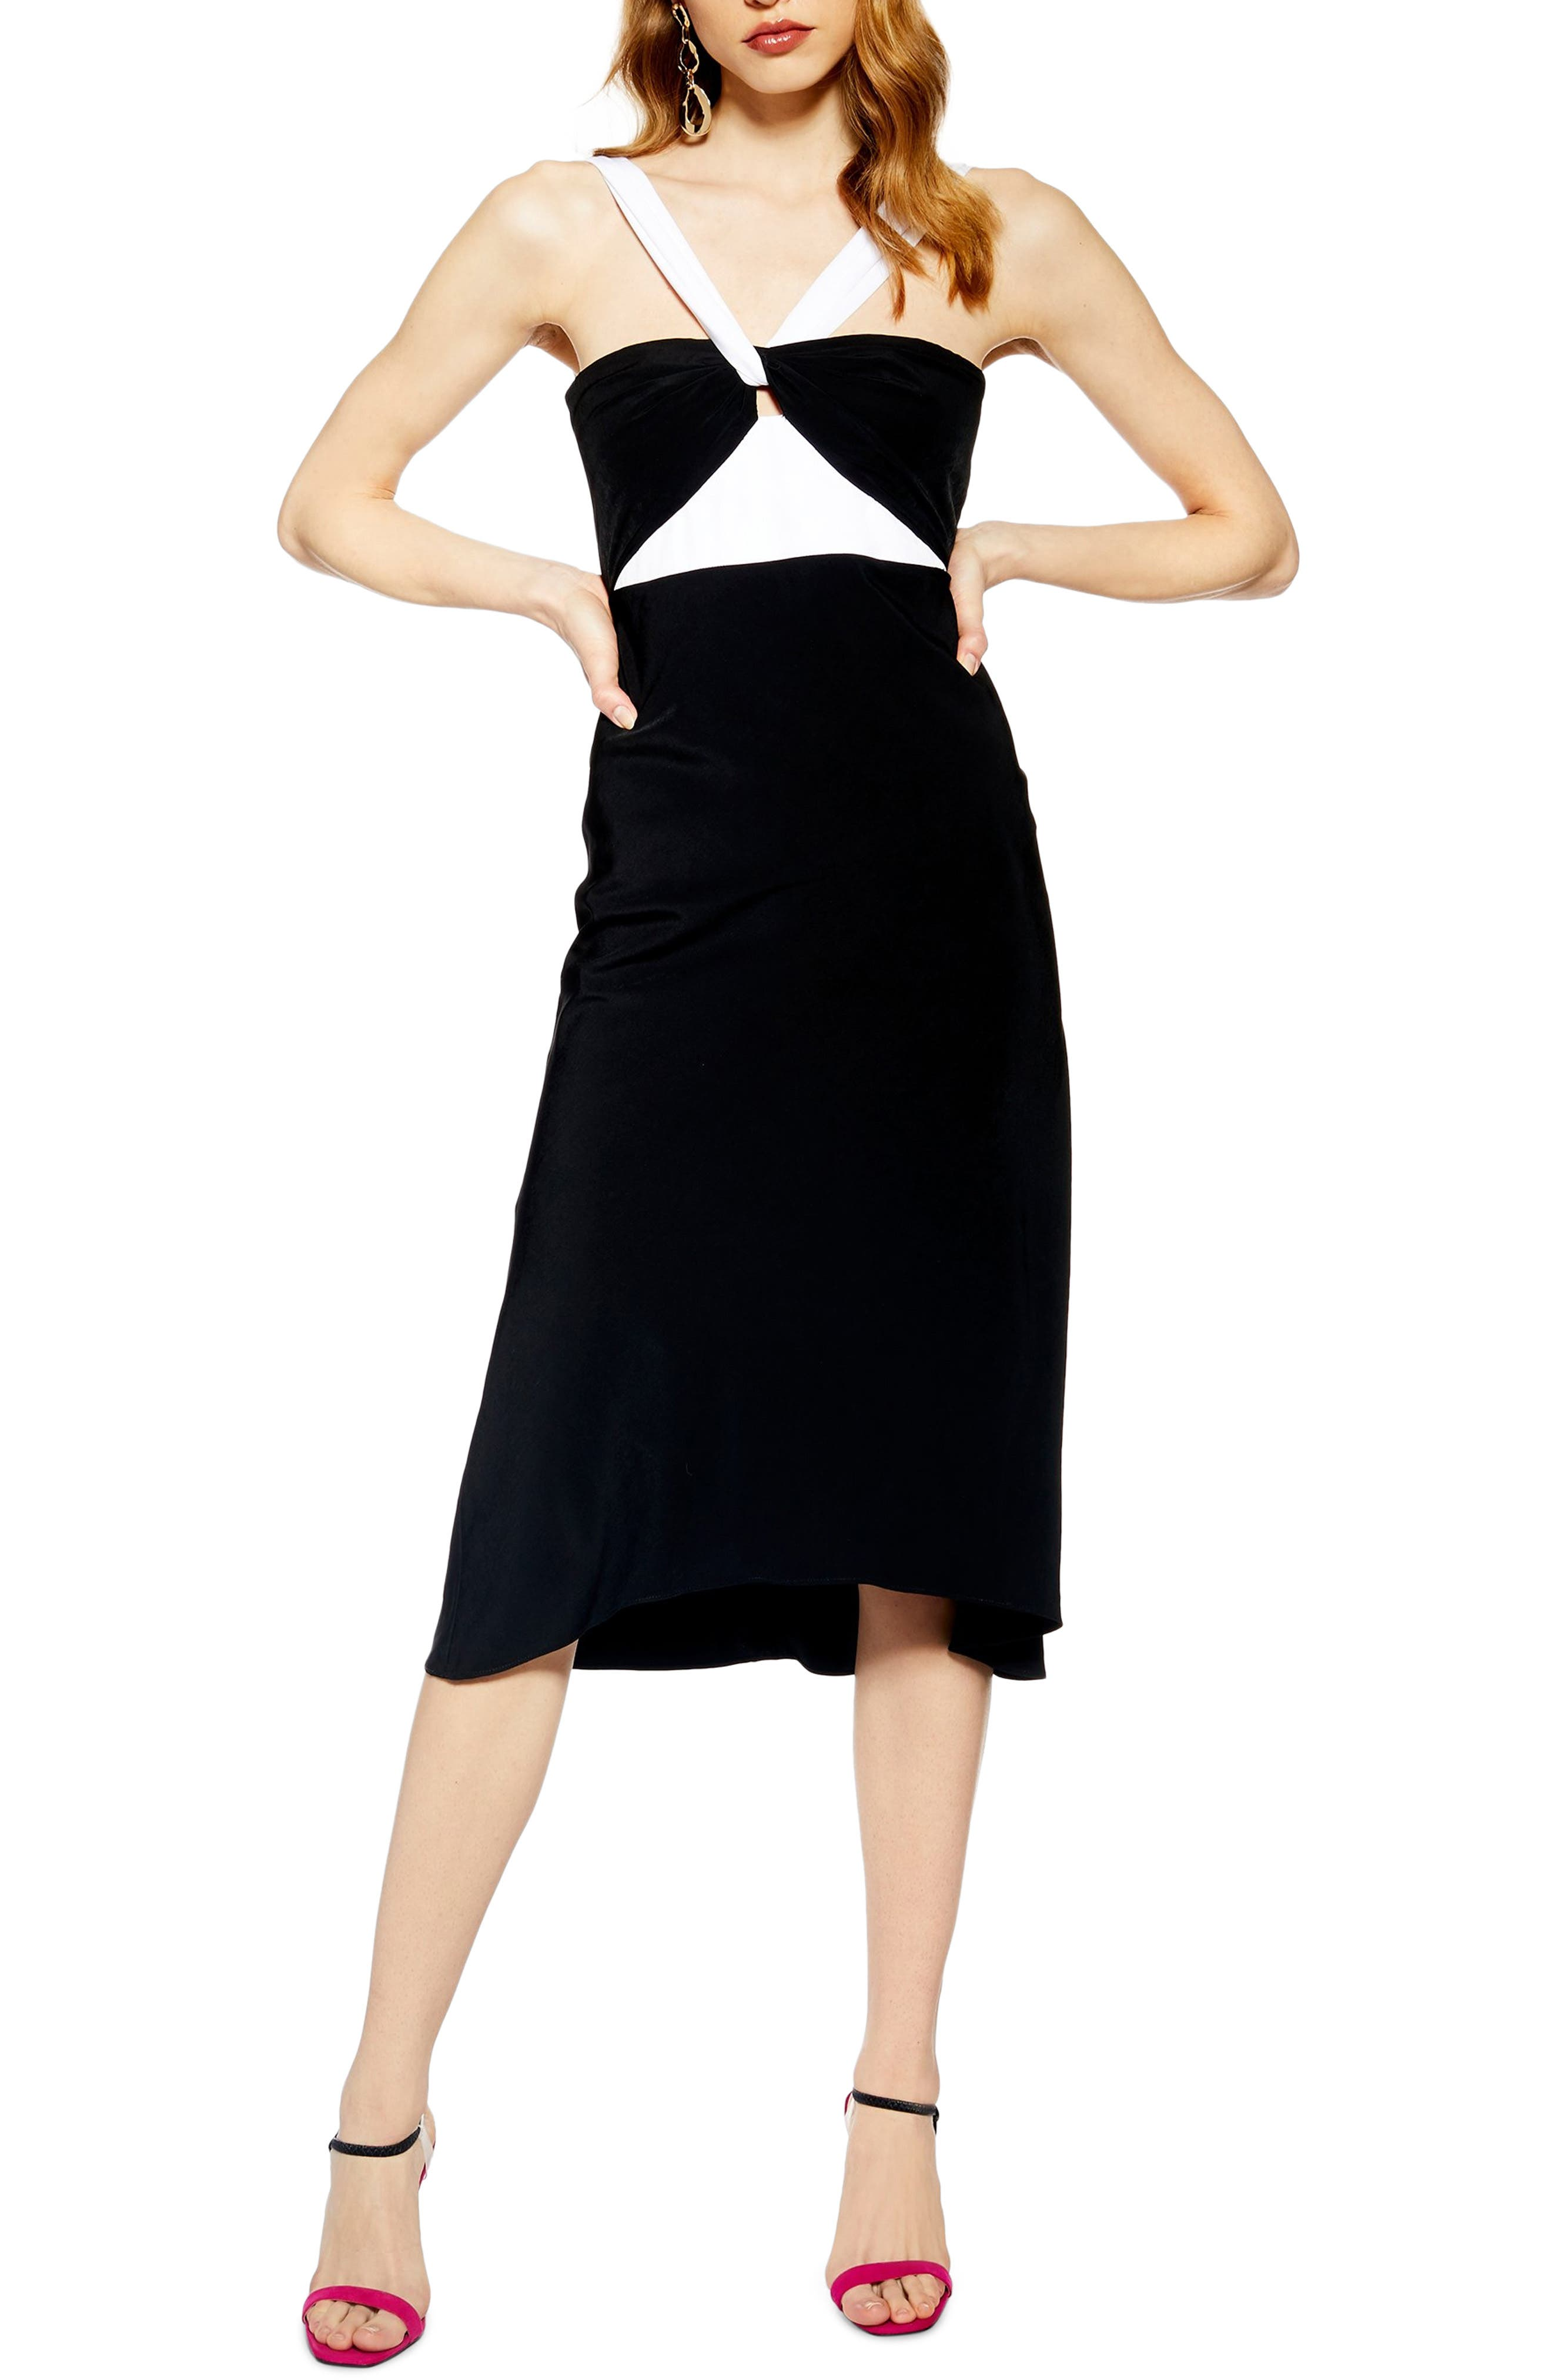 Topshop Twist Neck Halter Midi Dress, US (fits like 16-18) - Black